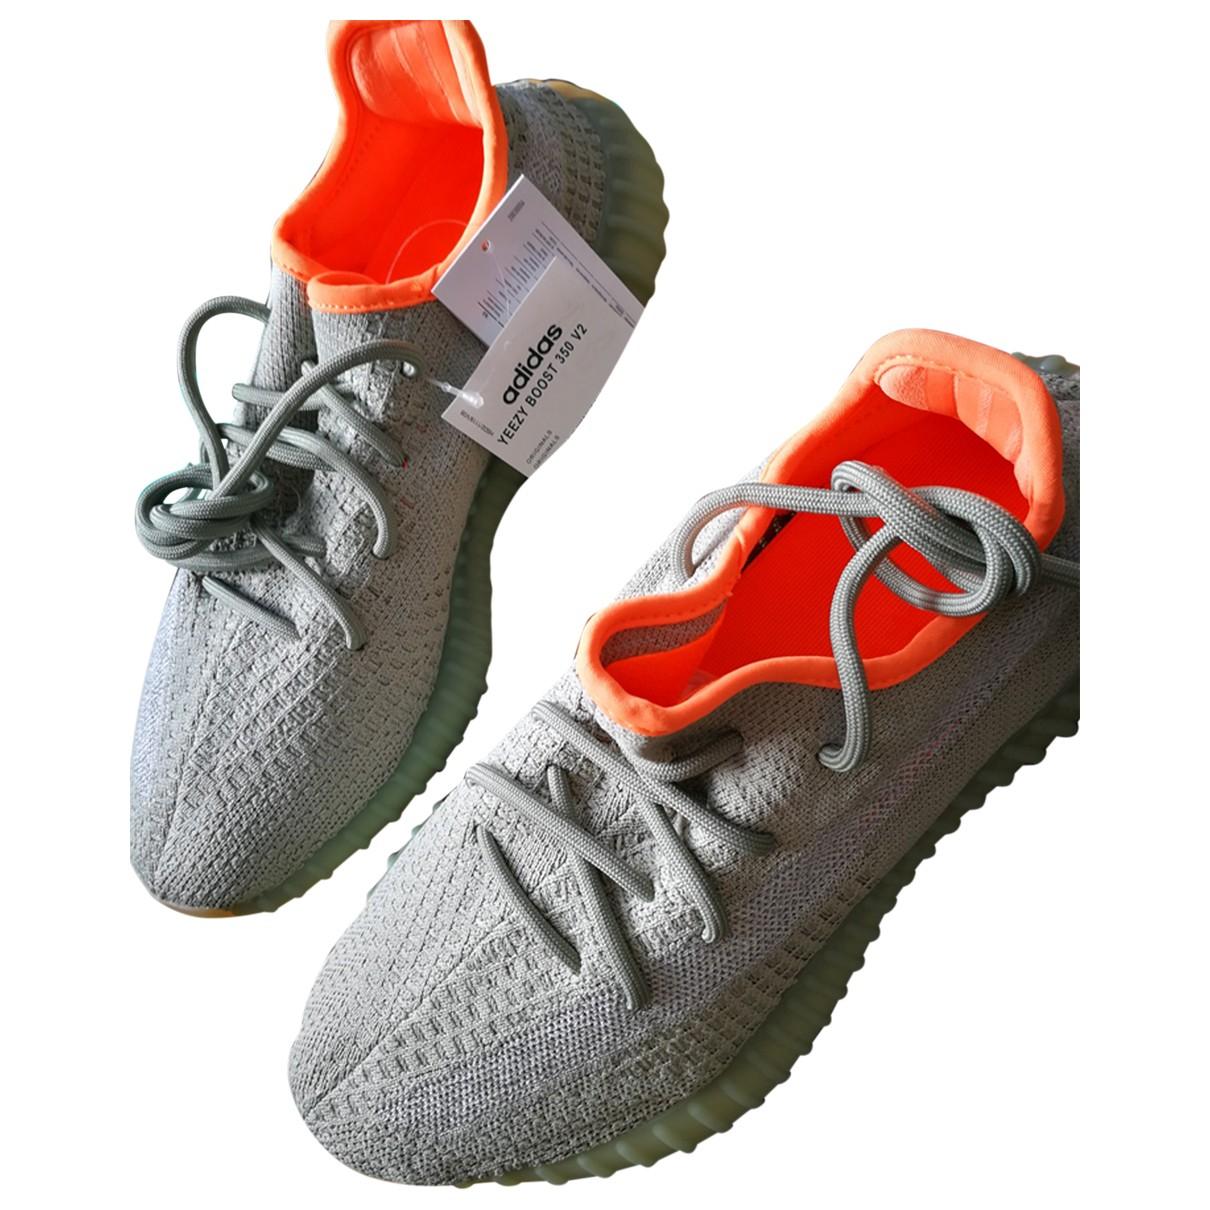 Yeezy X Adidas - Baskets Boost 350 V2 pour homme en toile - kaki